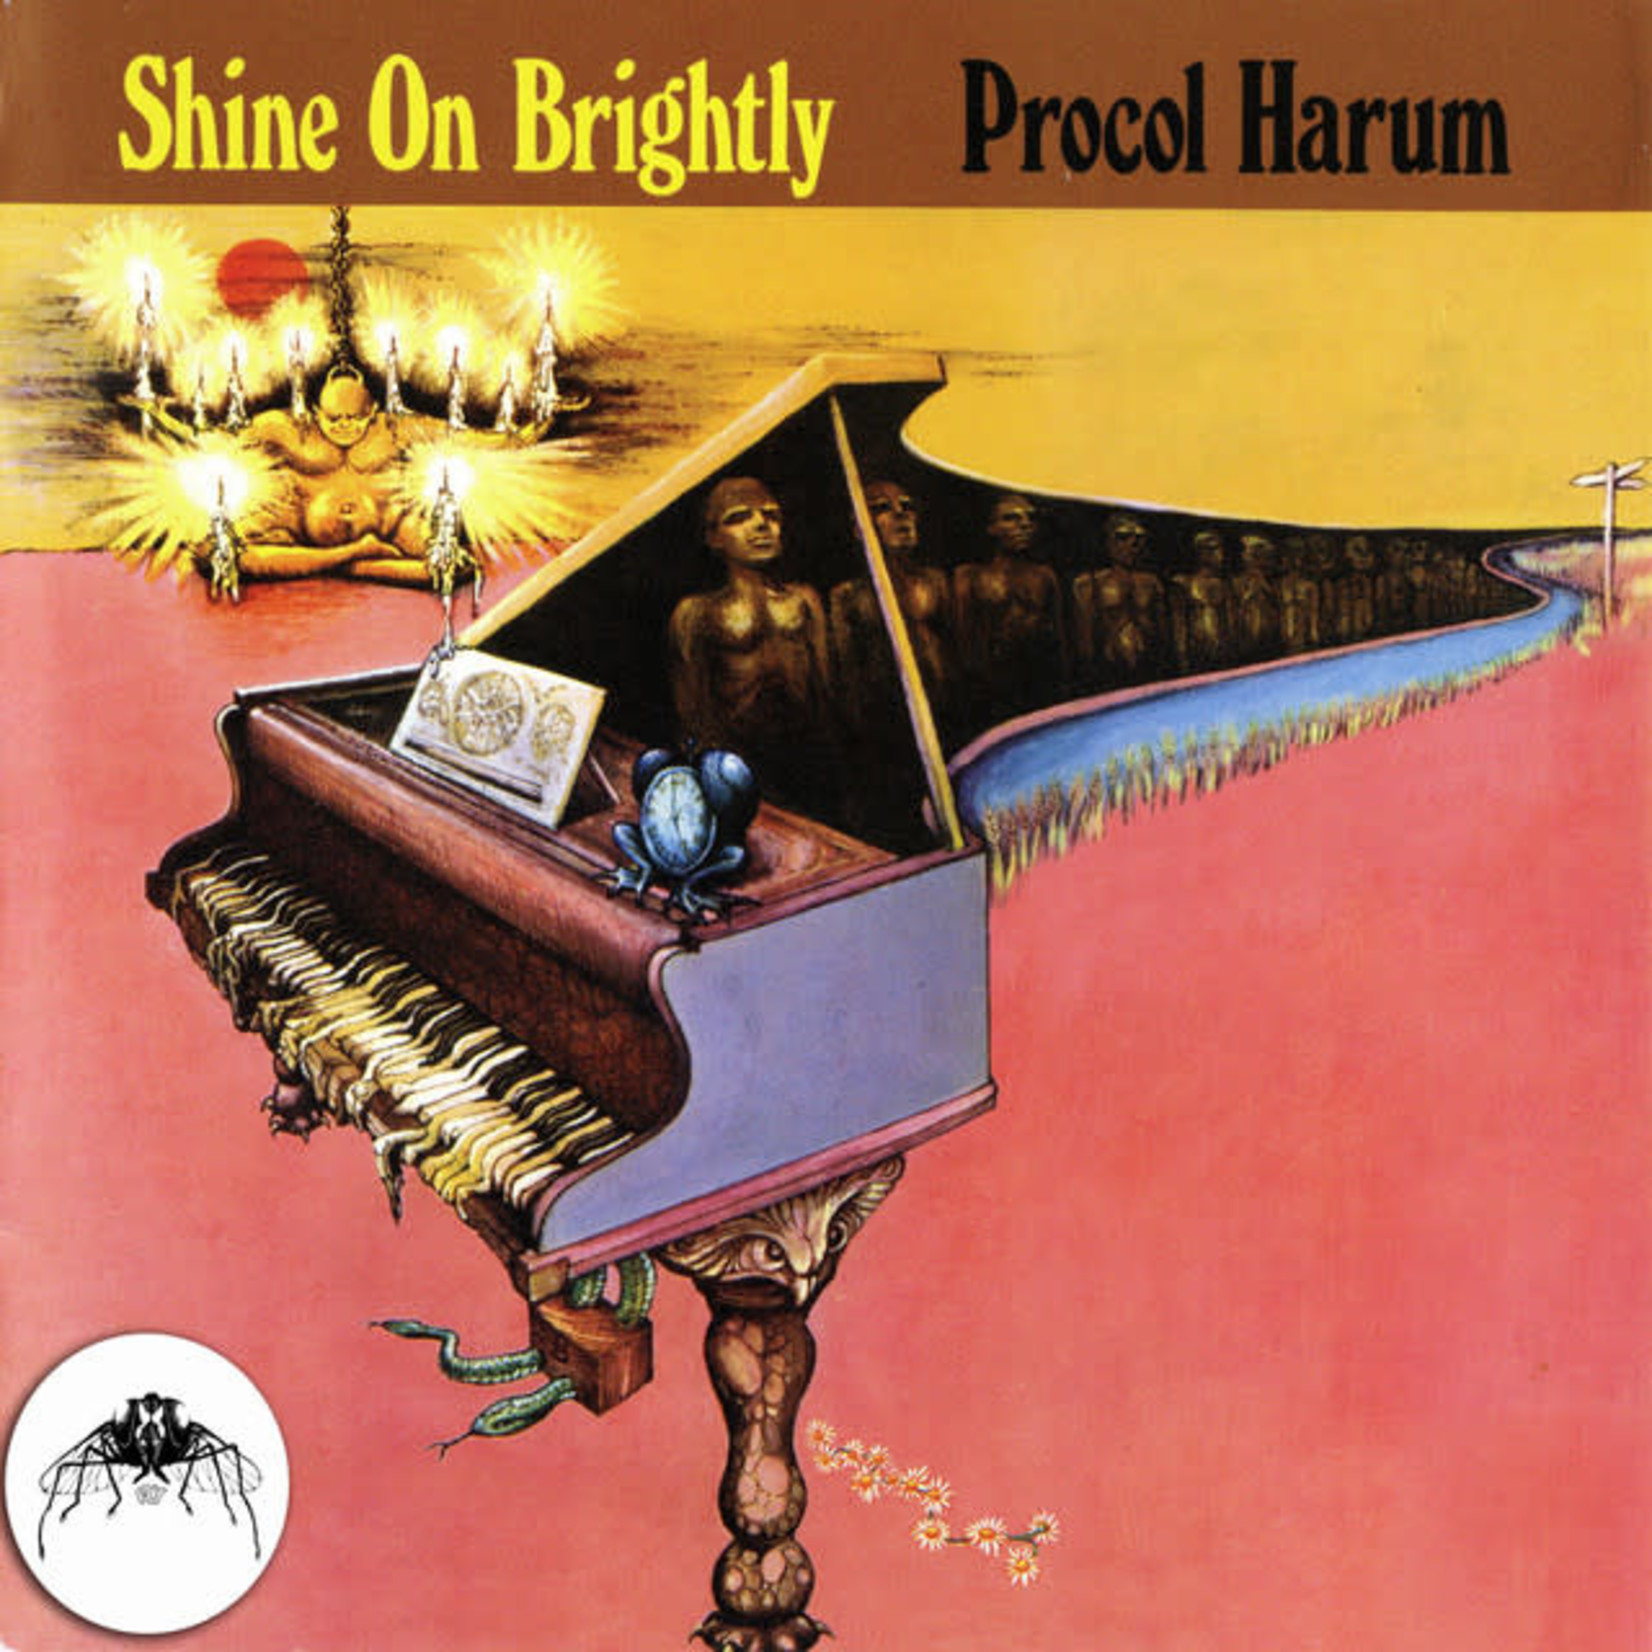 Vinyl Procol Harum - Shine On Brightly. $$